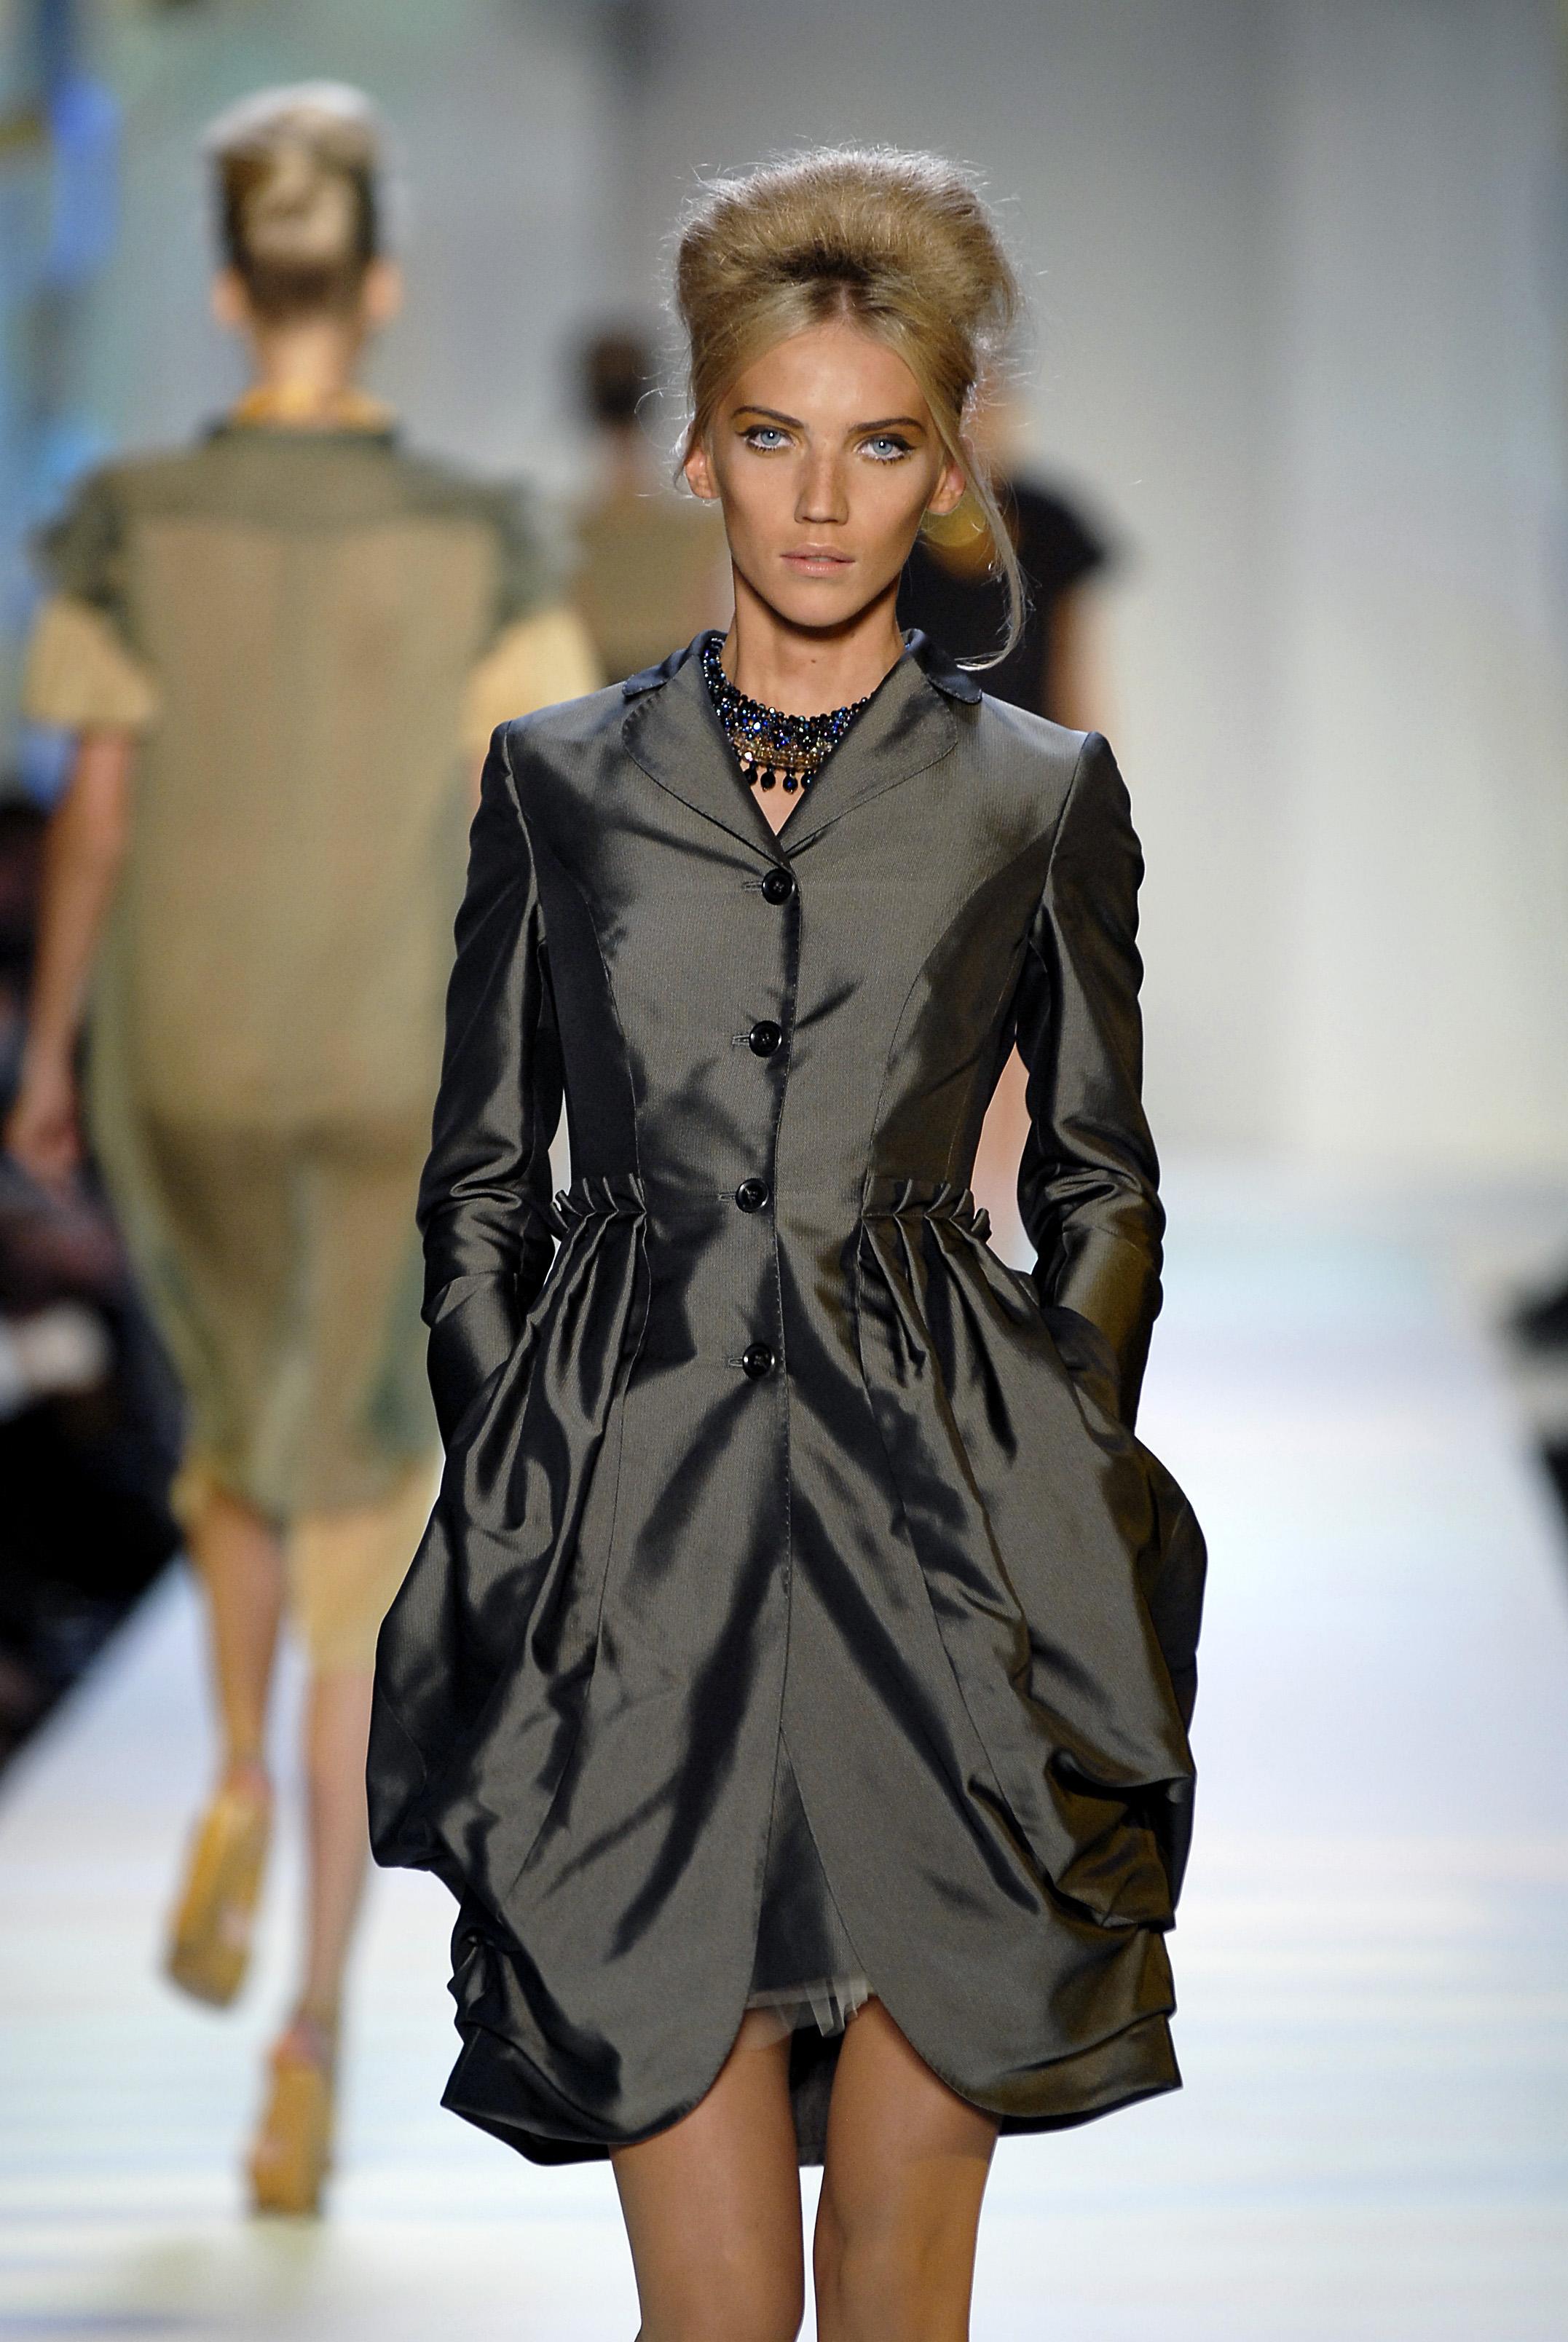 38857_celebrity_city_Moschino_Milan_Fashion_Show_26_123_410lo.jpg